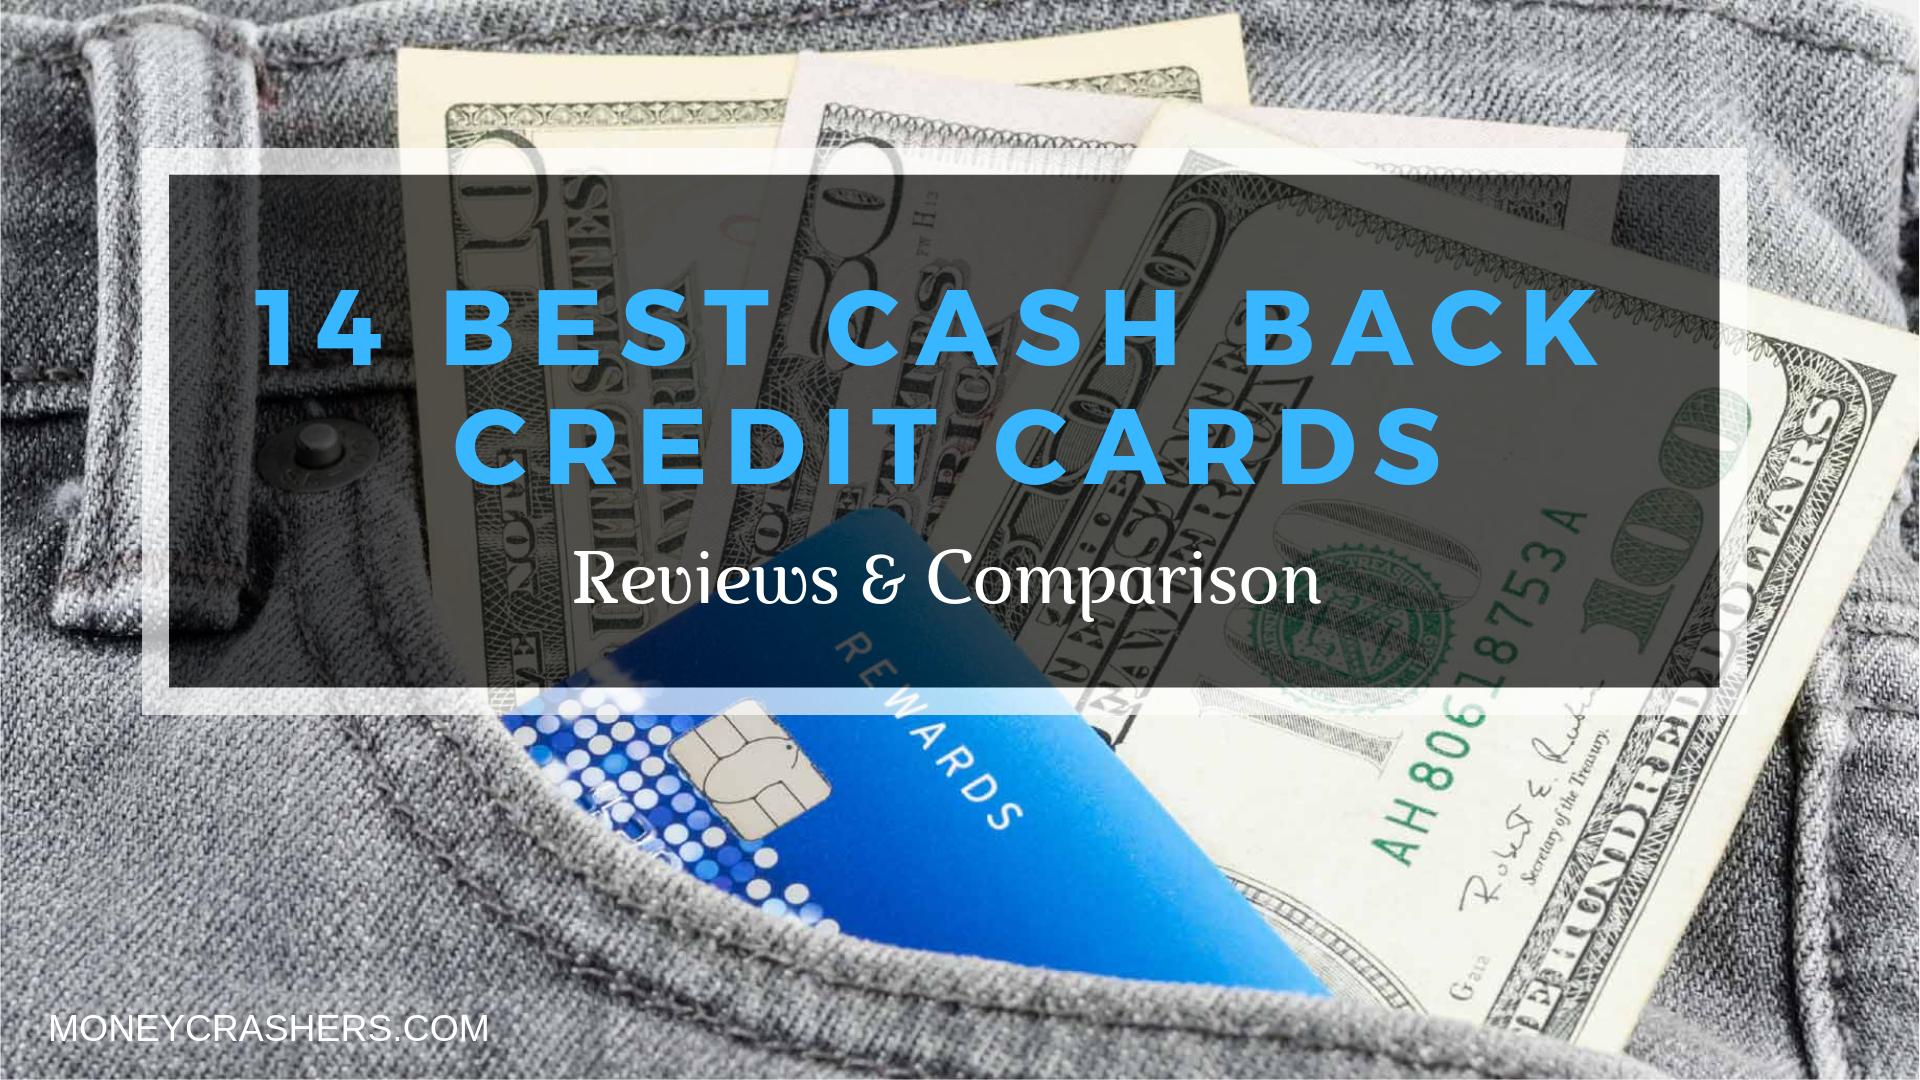 10 Best Cash Back Credit Cards of 2020 - Reviews & Comparison   Credit card, Credit card reviews ...